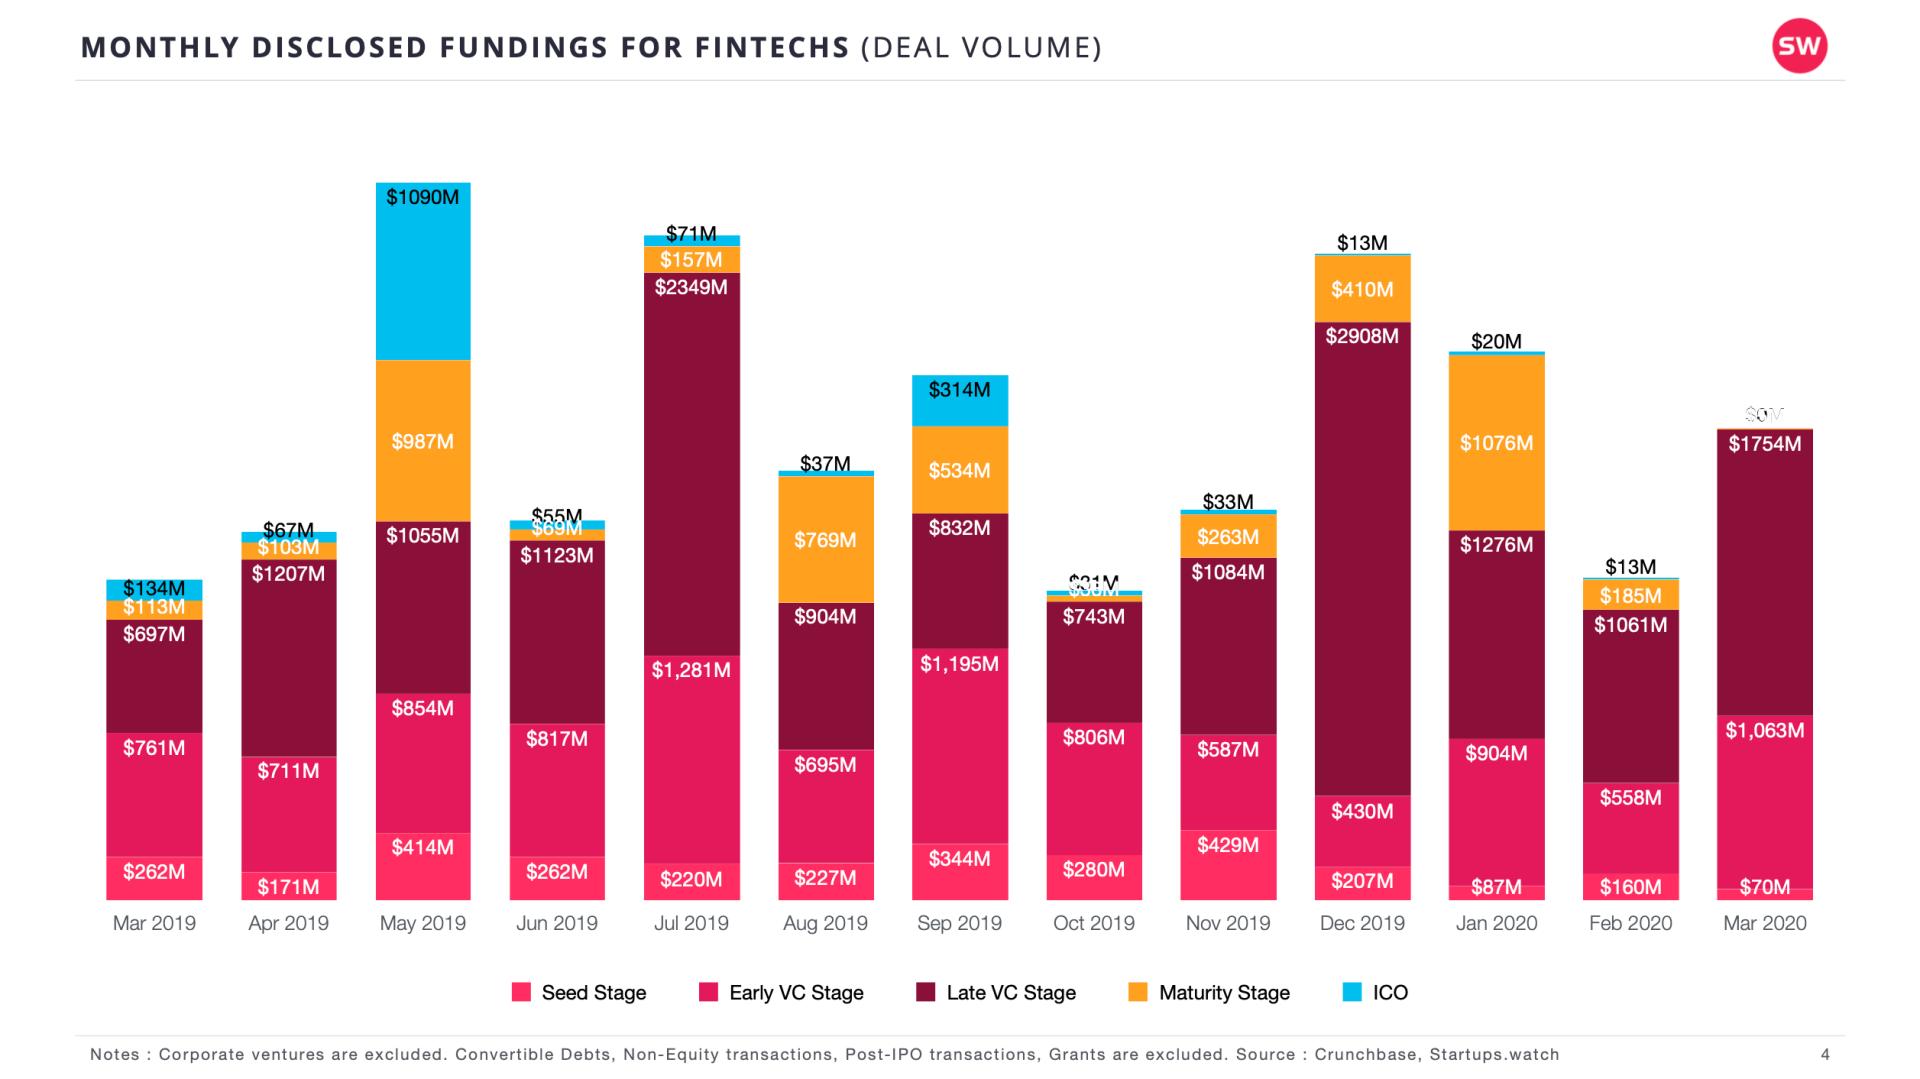 Startups.Watch küresel FinTech Raporları - Mart 2020